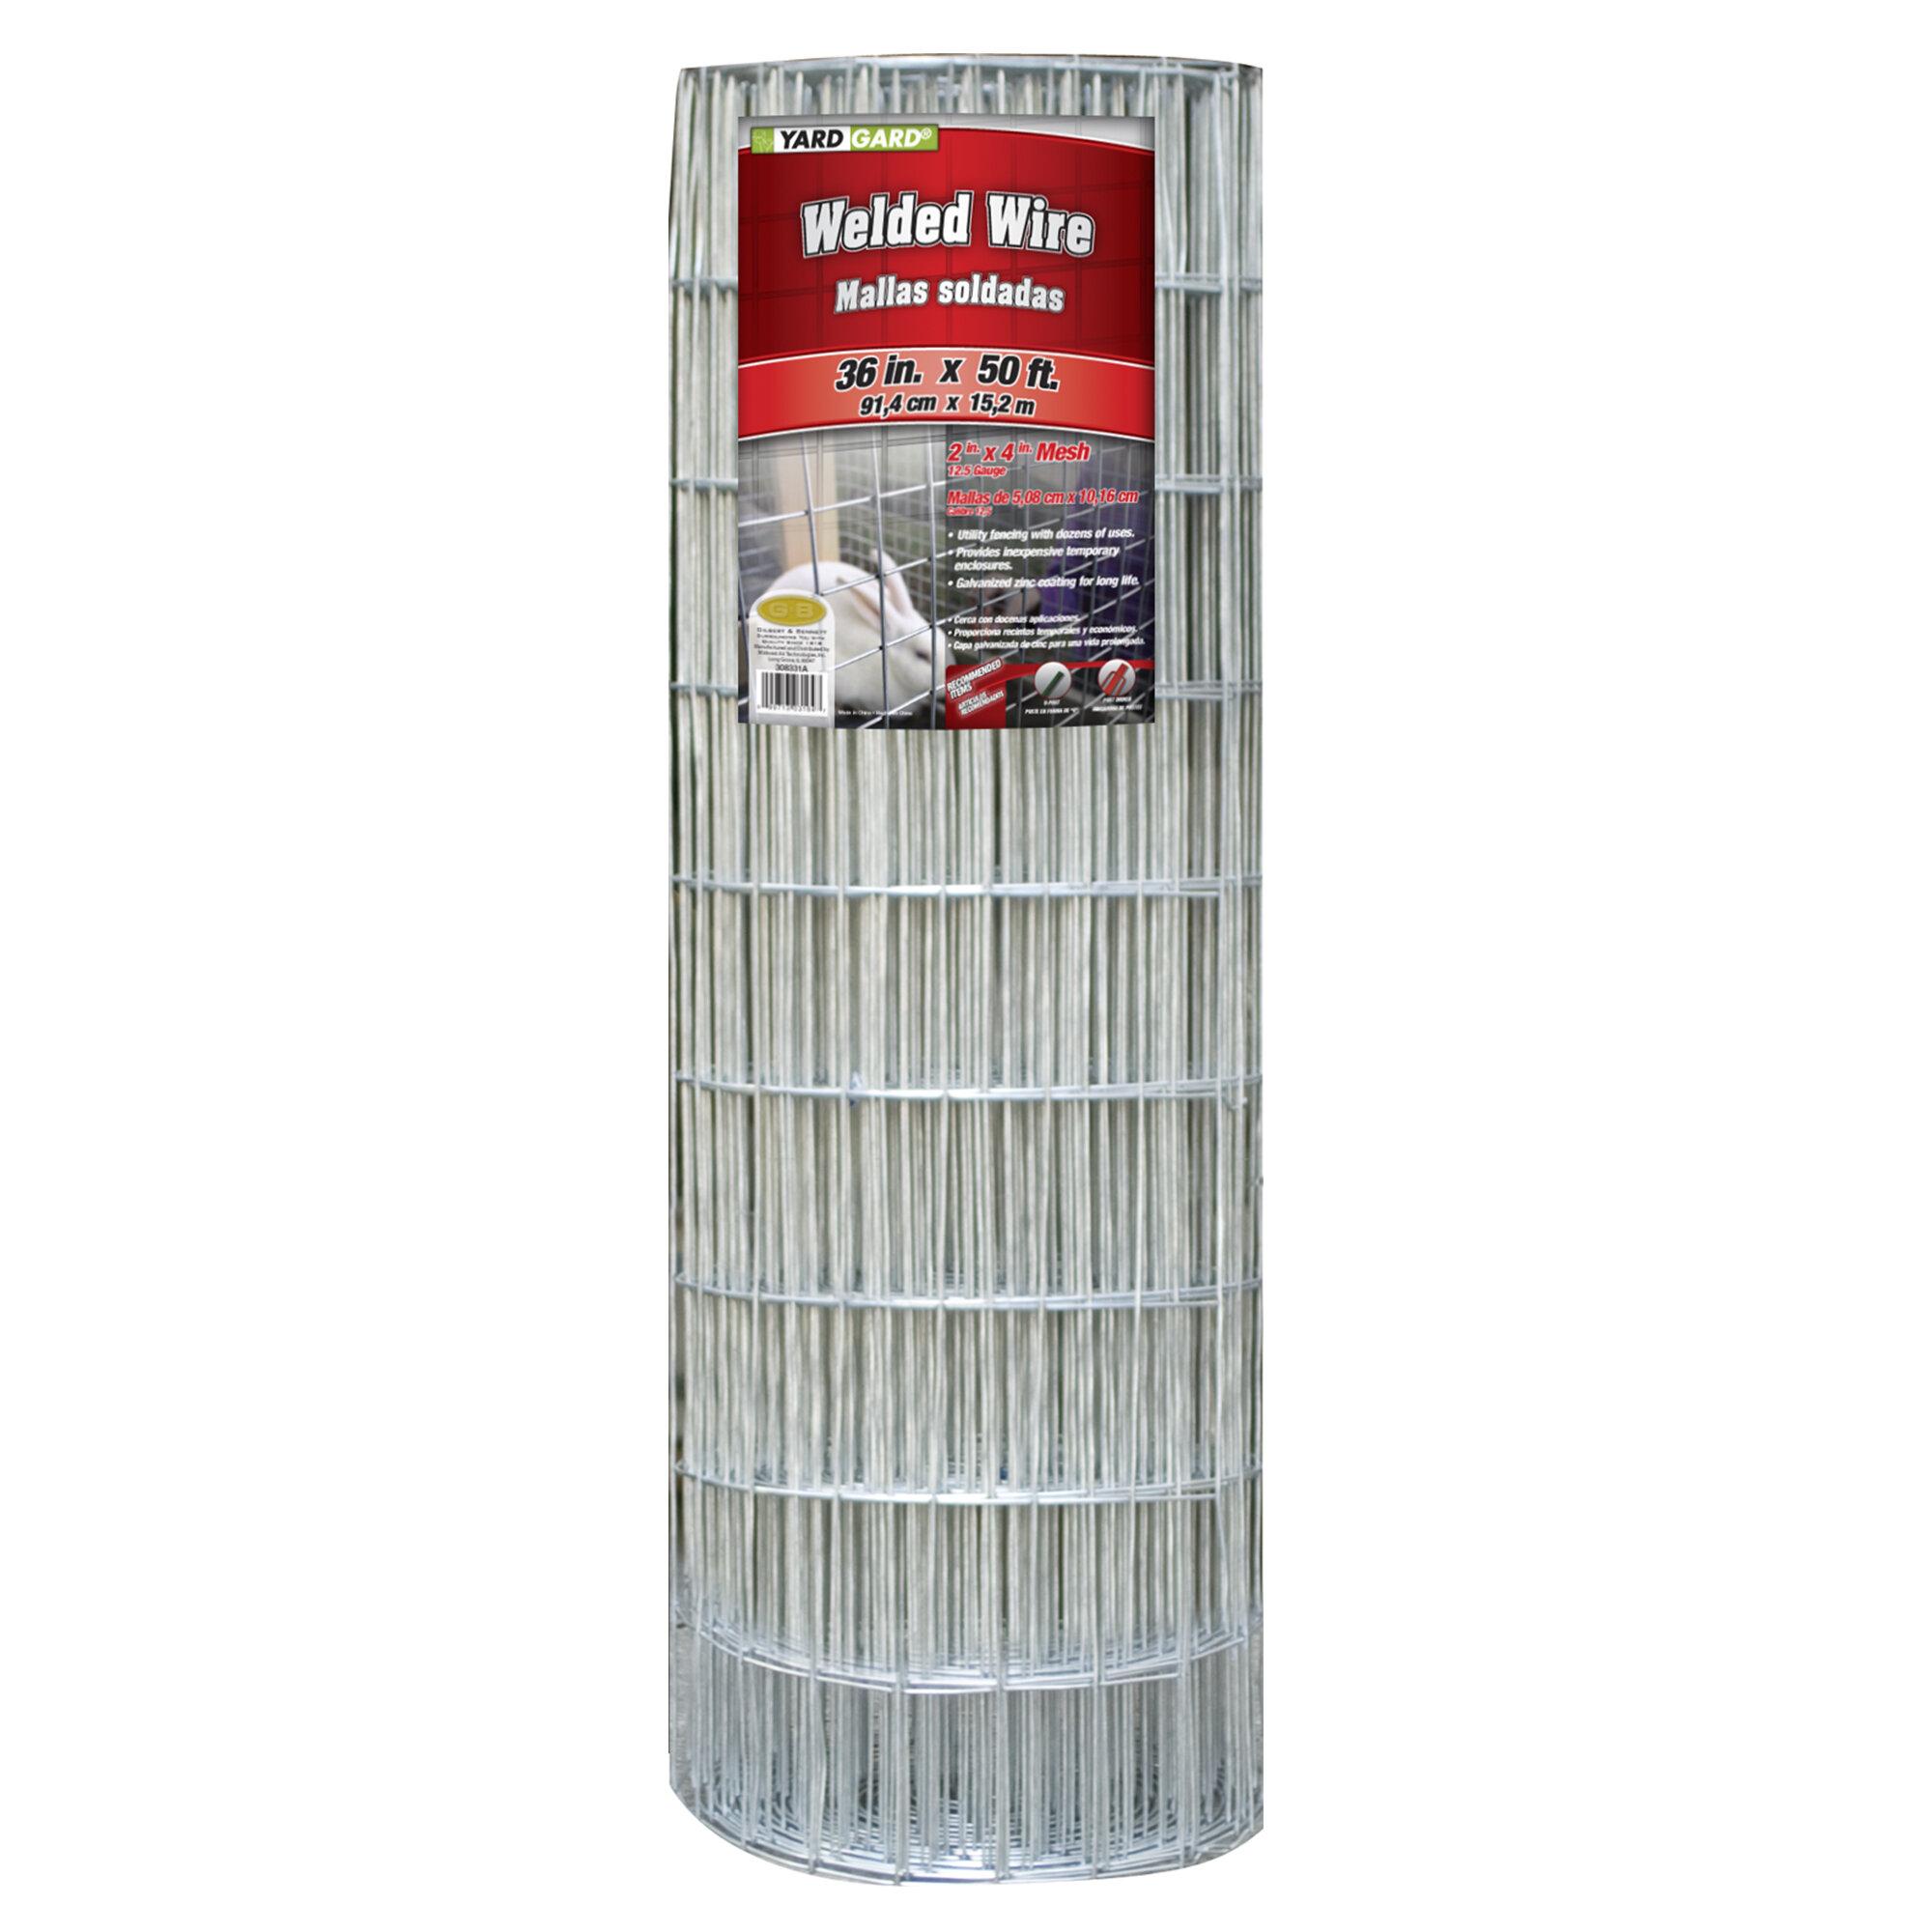 YARDGARD 12.5 Gauge Mesh Galvanized Welded Wire | Wayfair